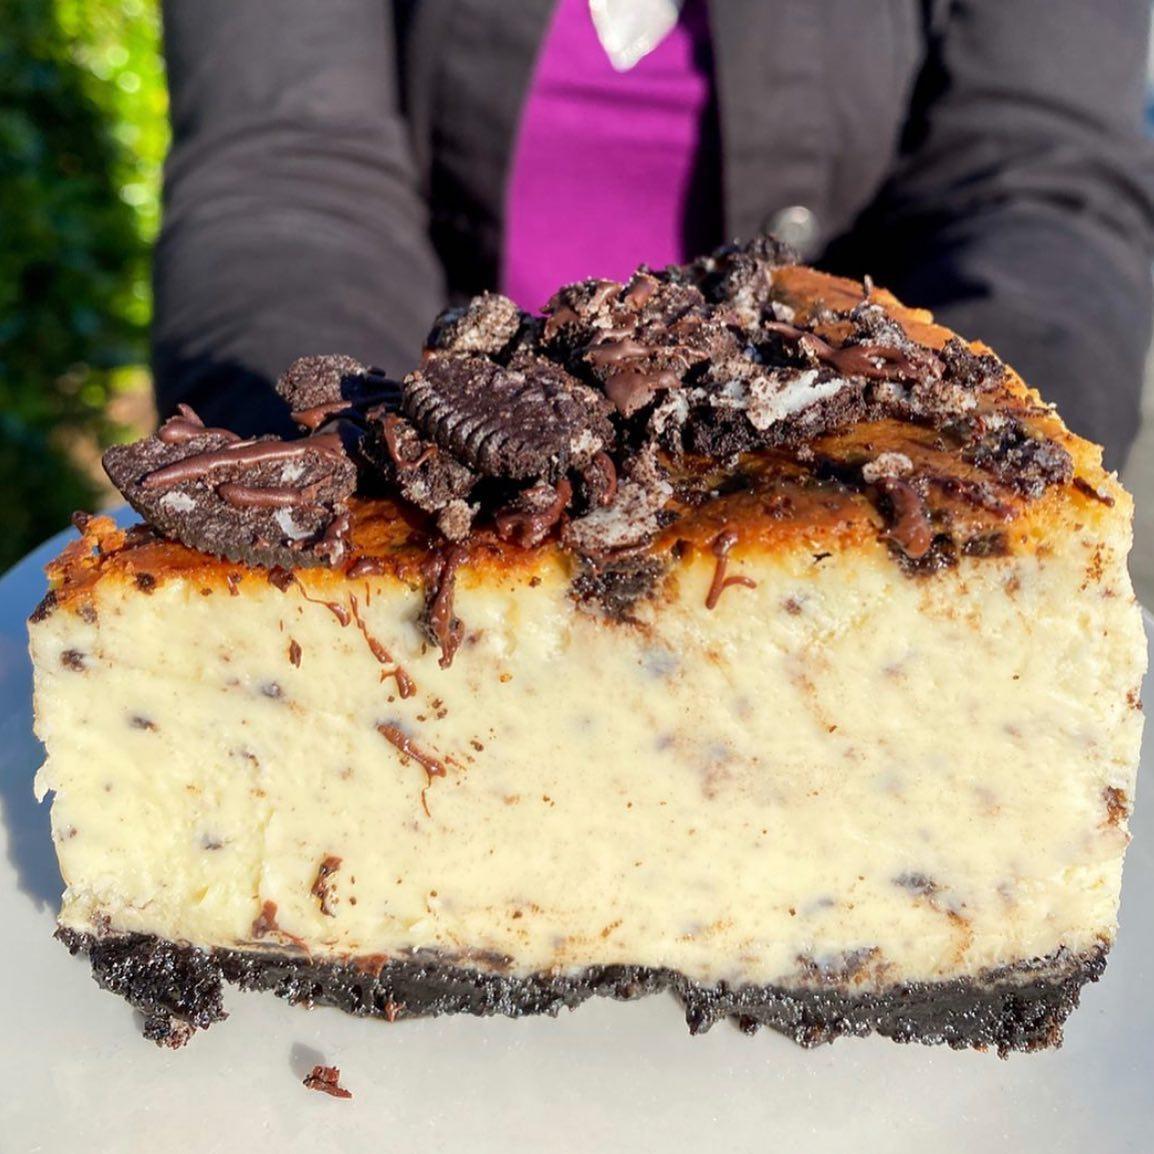 Royal Cheesecake & Varieties National Cheesecake Day